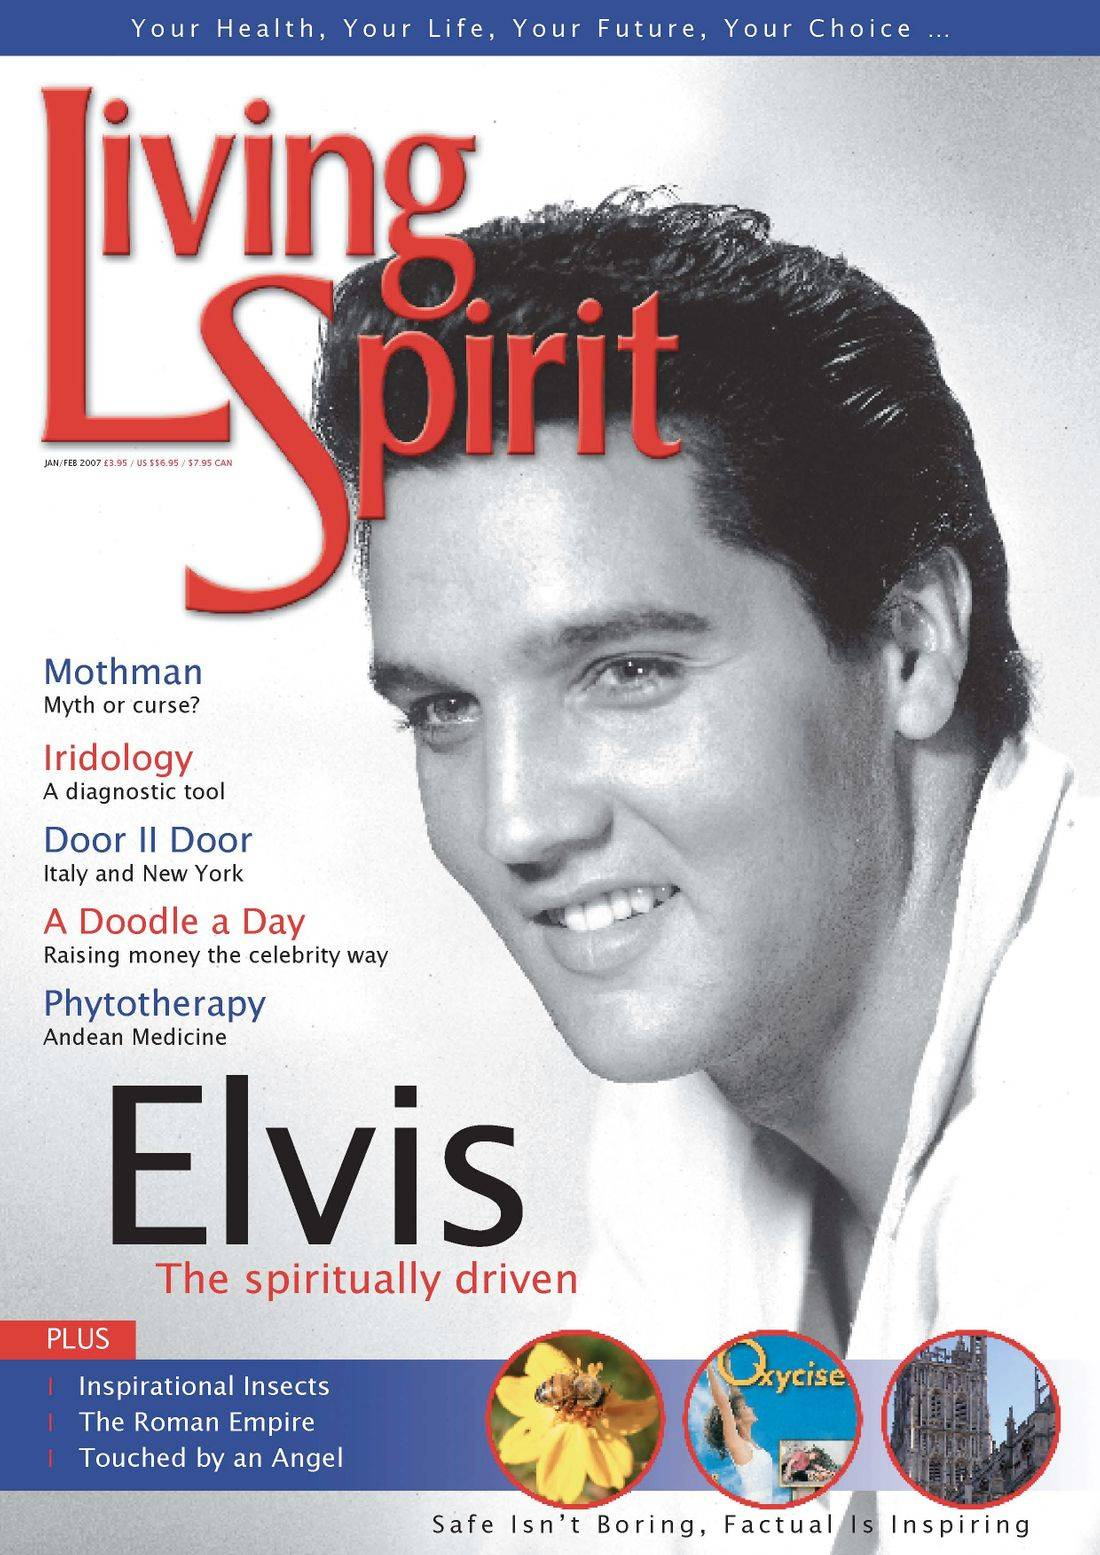 Living Spirit Magazine - quarterly release - spirituality, education, relationships, politics, travel, holiday markets